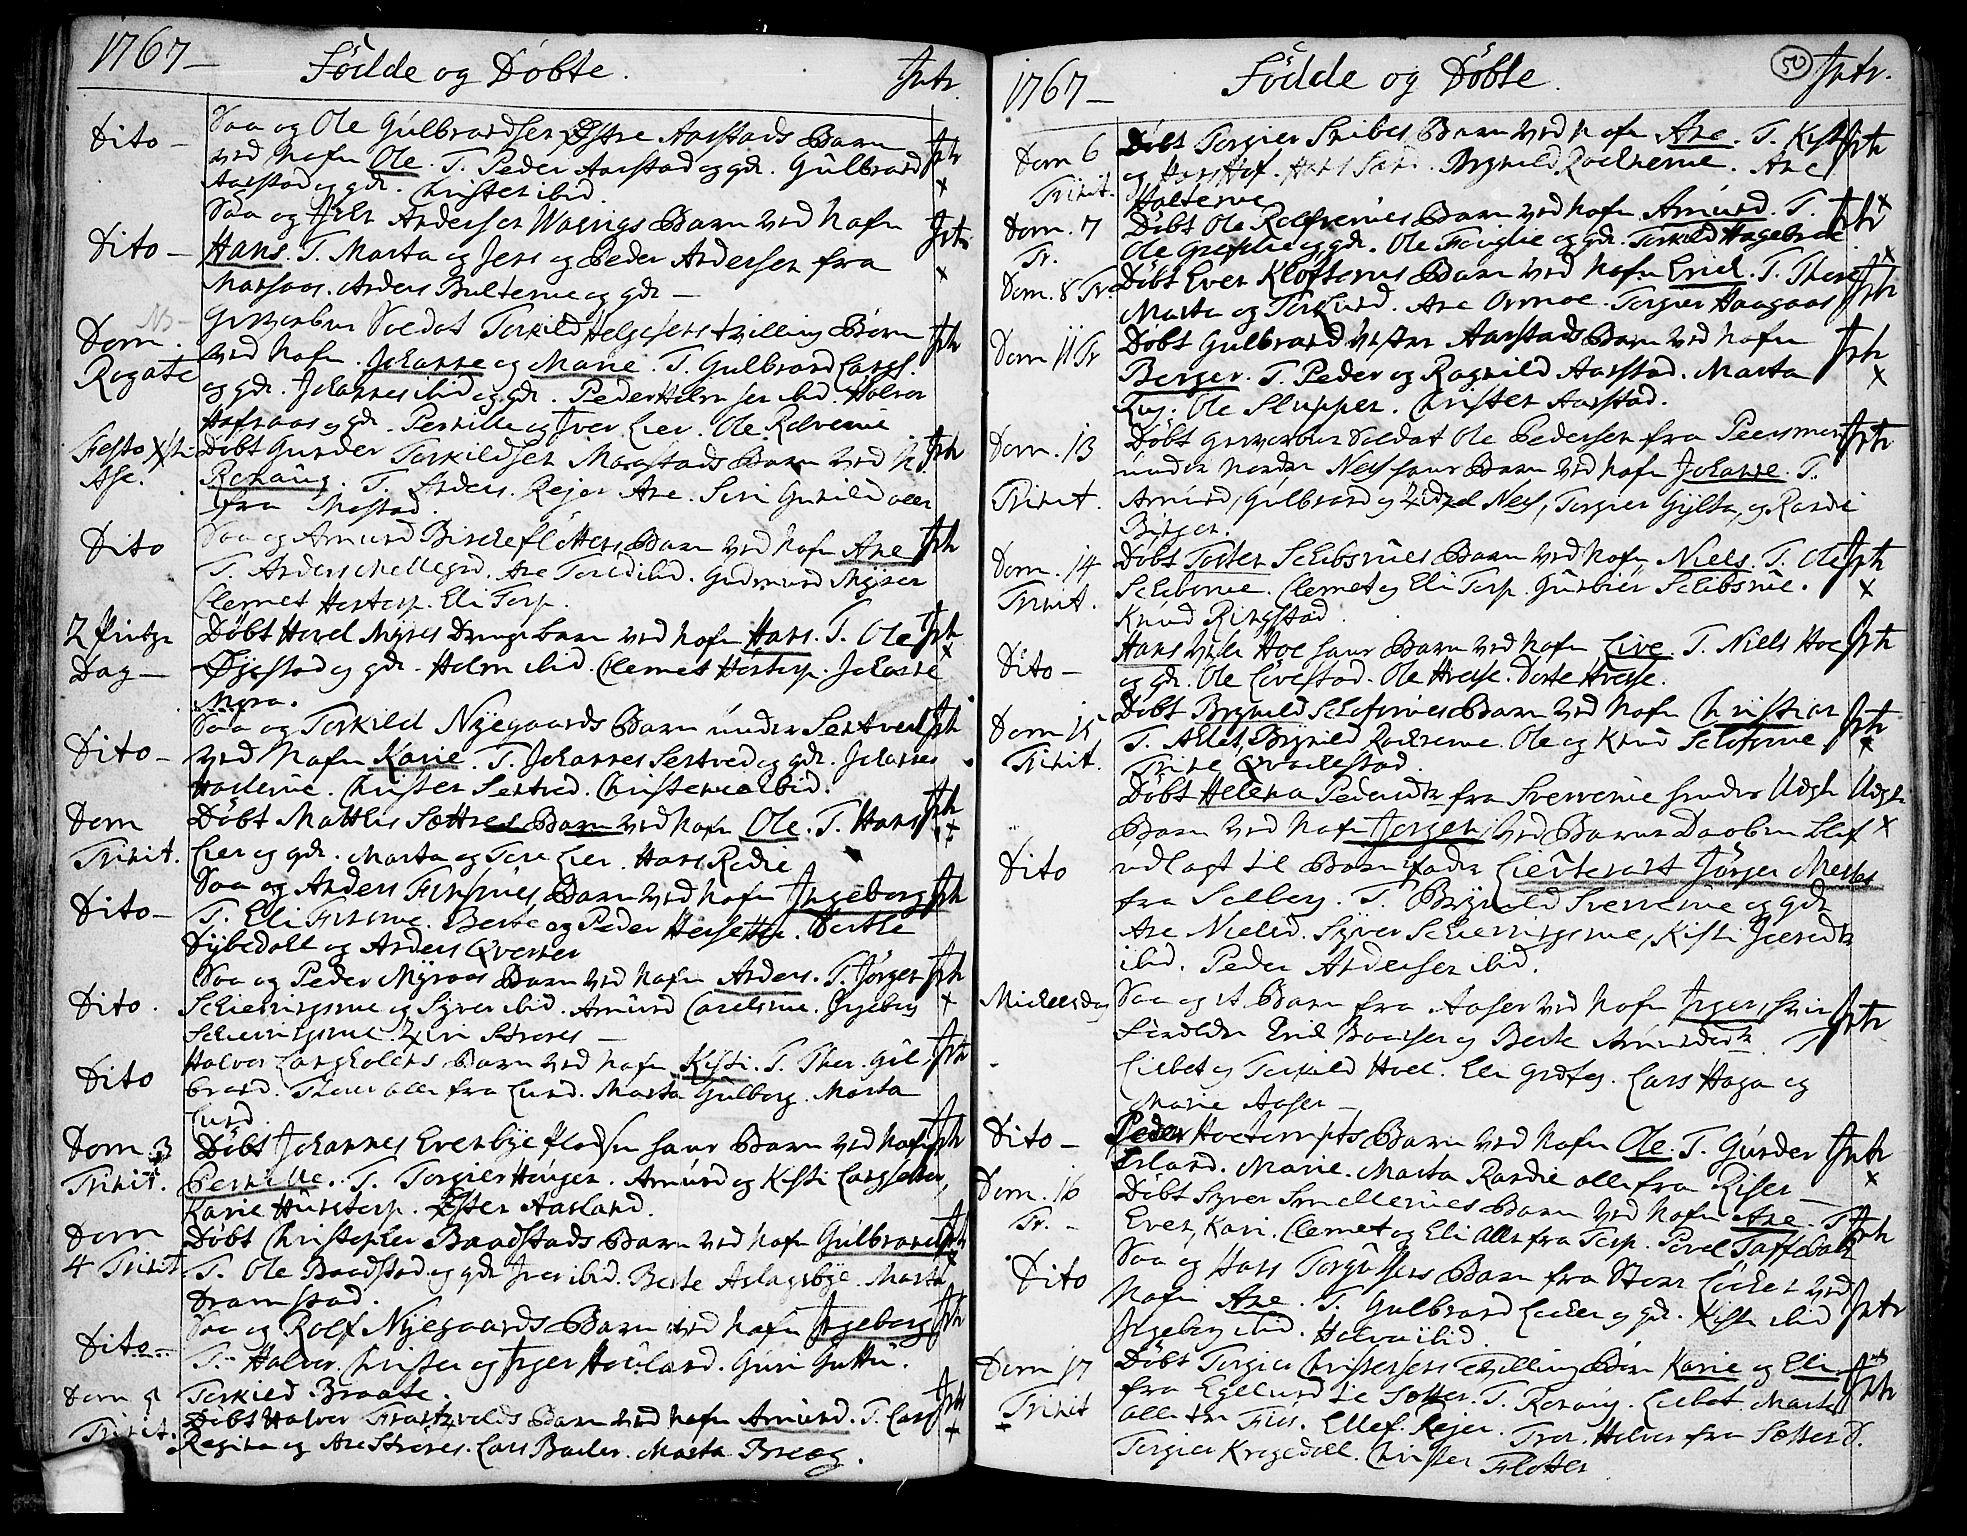 SAO, Trøgstad prestekontor Kirkebøker, F/Fa/L0004: Parish register (official) no. I 4, 1750-1784, p. 50